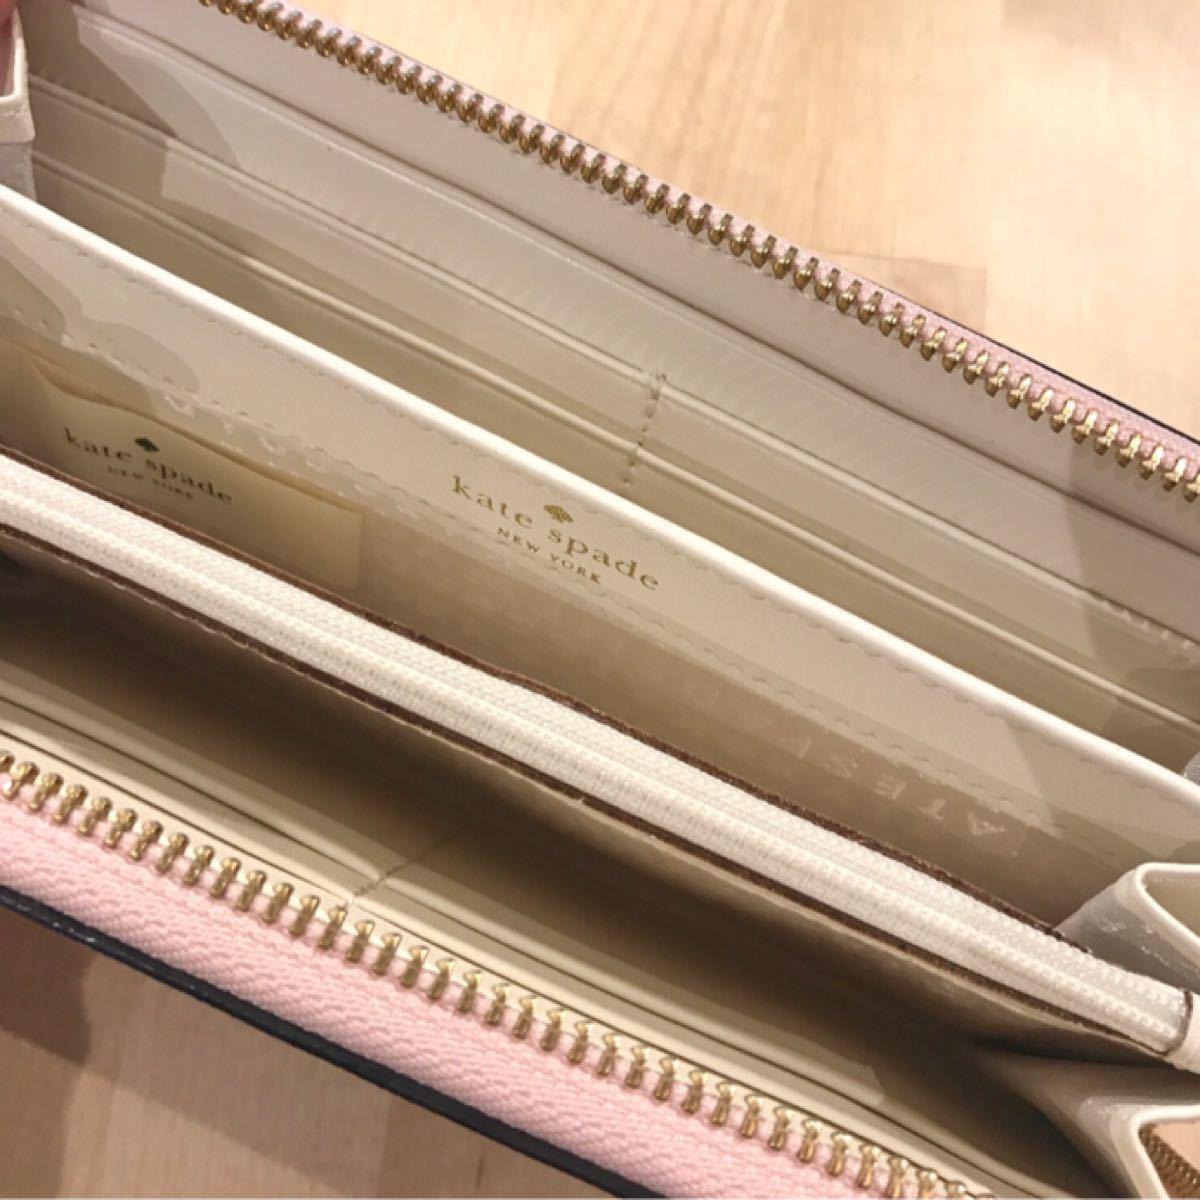 ☆kate spade new york☆長財布/薄ピンク/新品・未使用♪